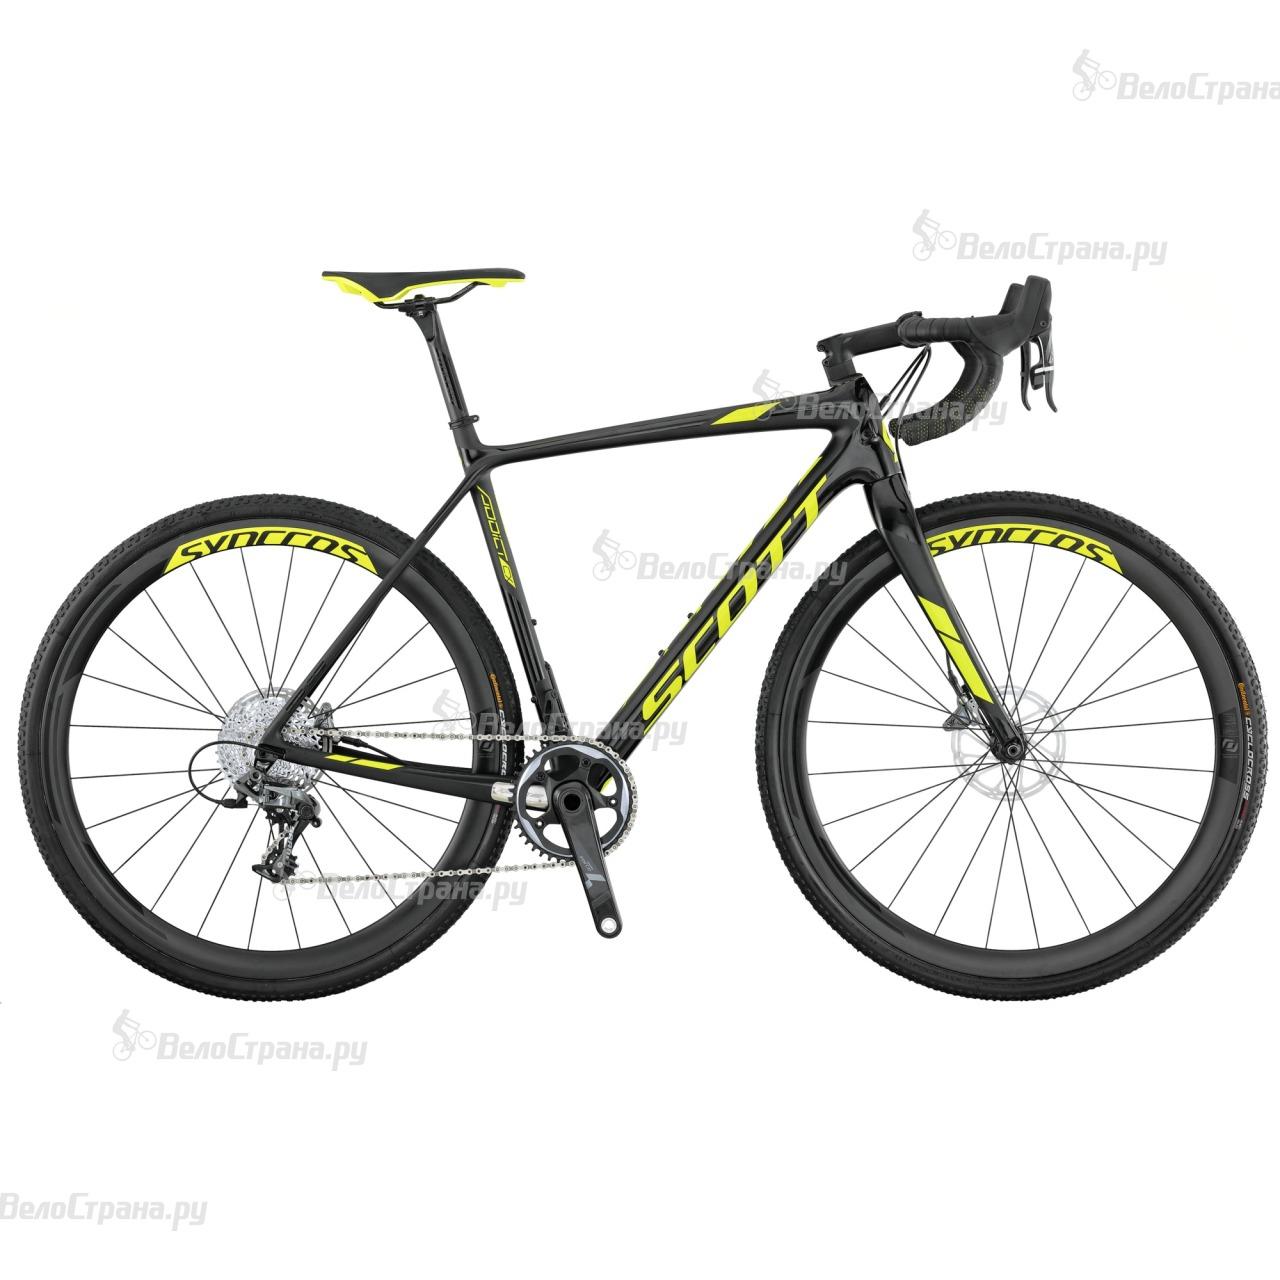 Велосипед Scott Addict CX 10 Disc (2017) scott addict sl compact 2015